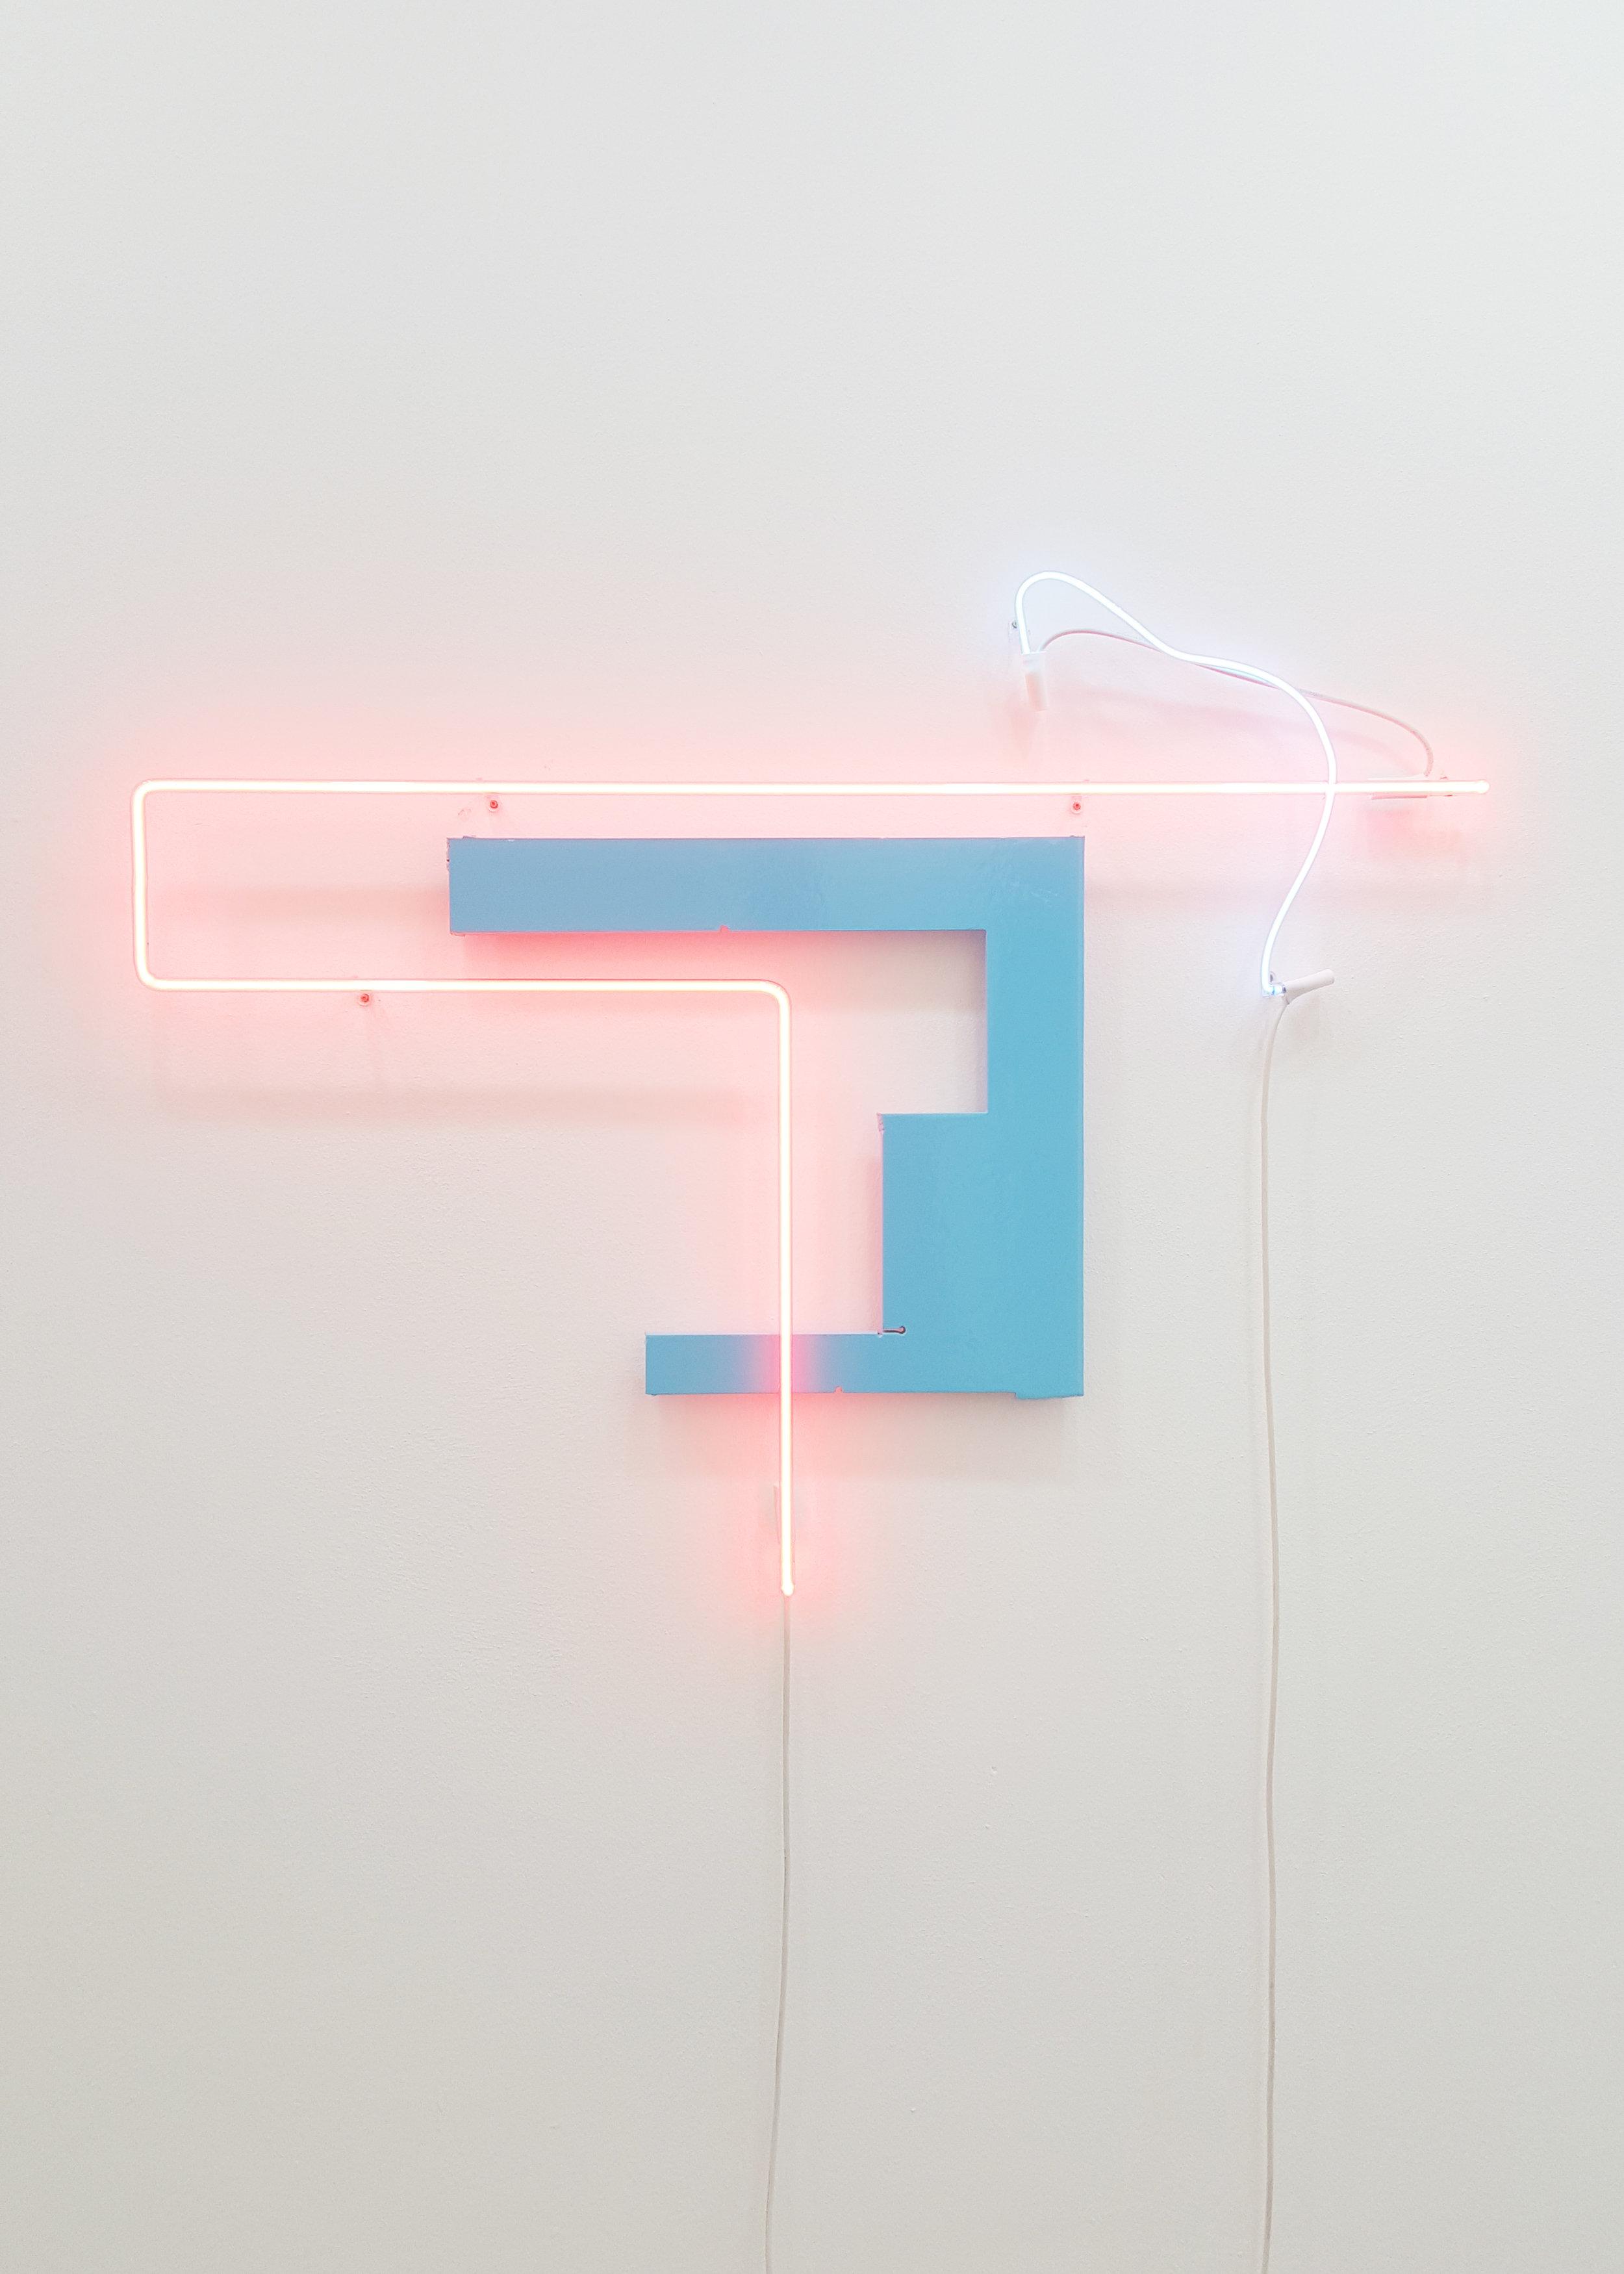 'The Key nr.3' 2018 Kunstpalais Erlagen